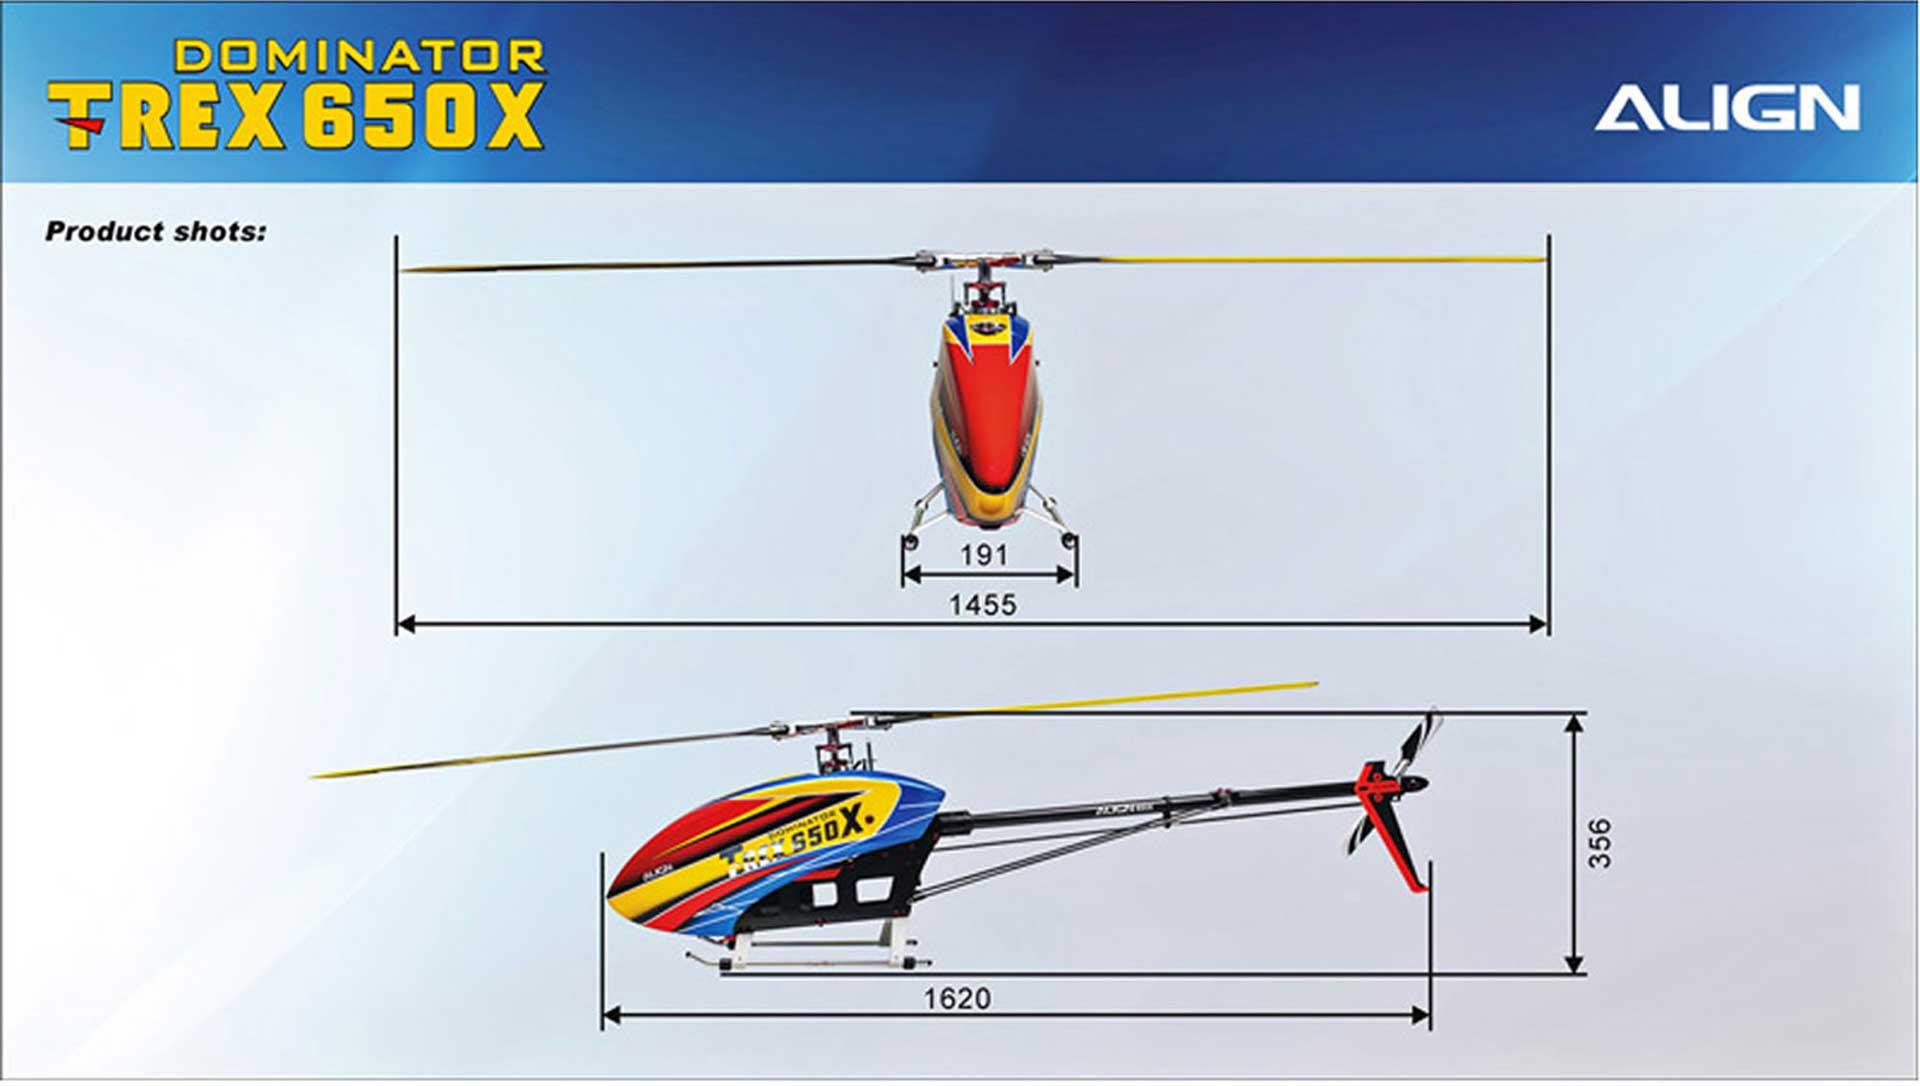 ALIGN T-REX 650X Dominator Combo (12S)